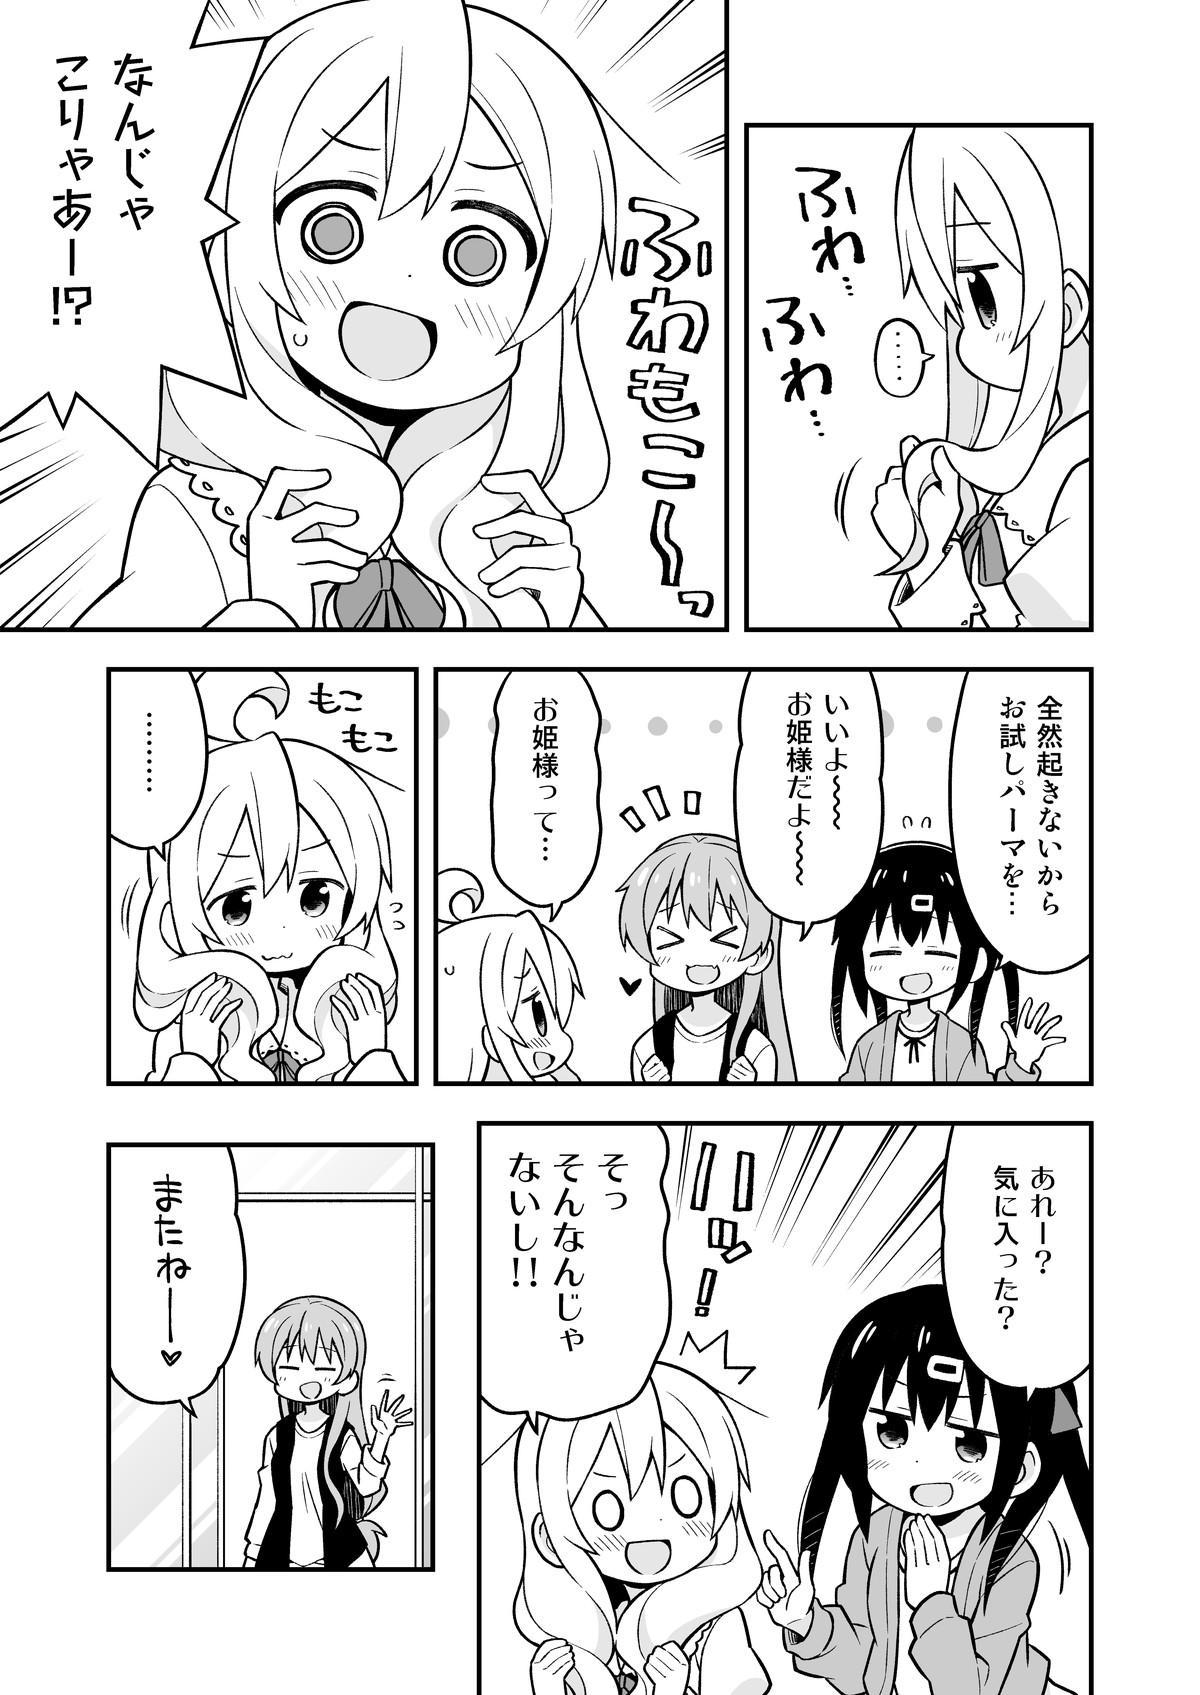 Onii-chan wa Oshimai! 6 9